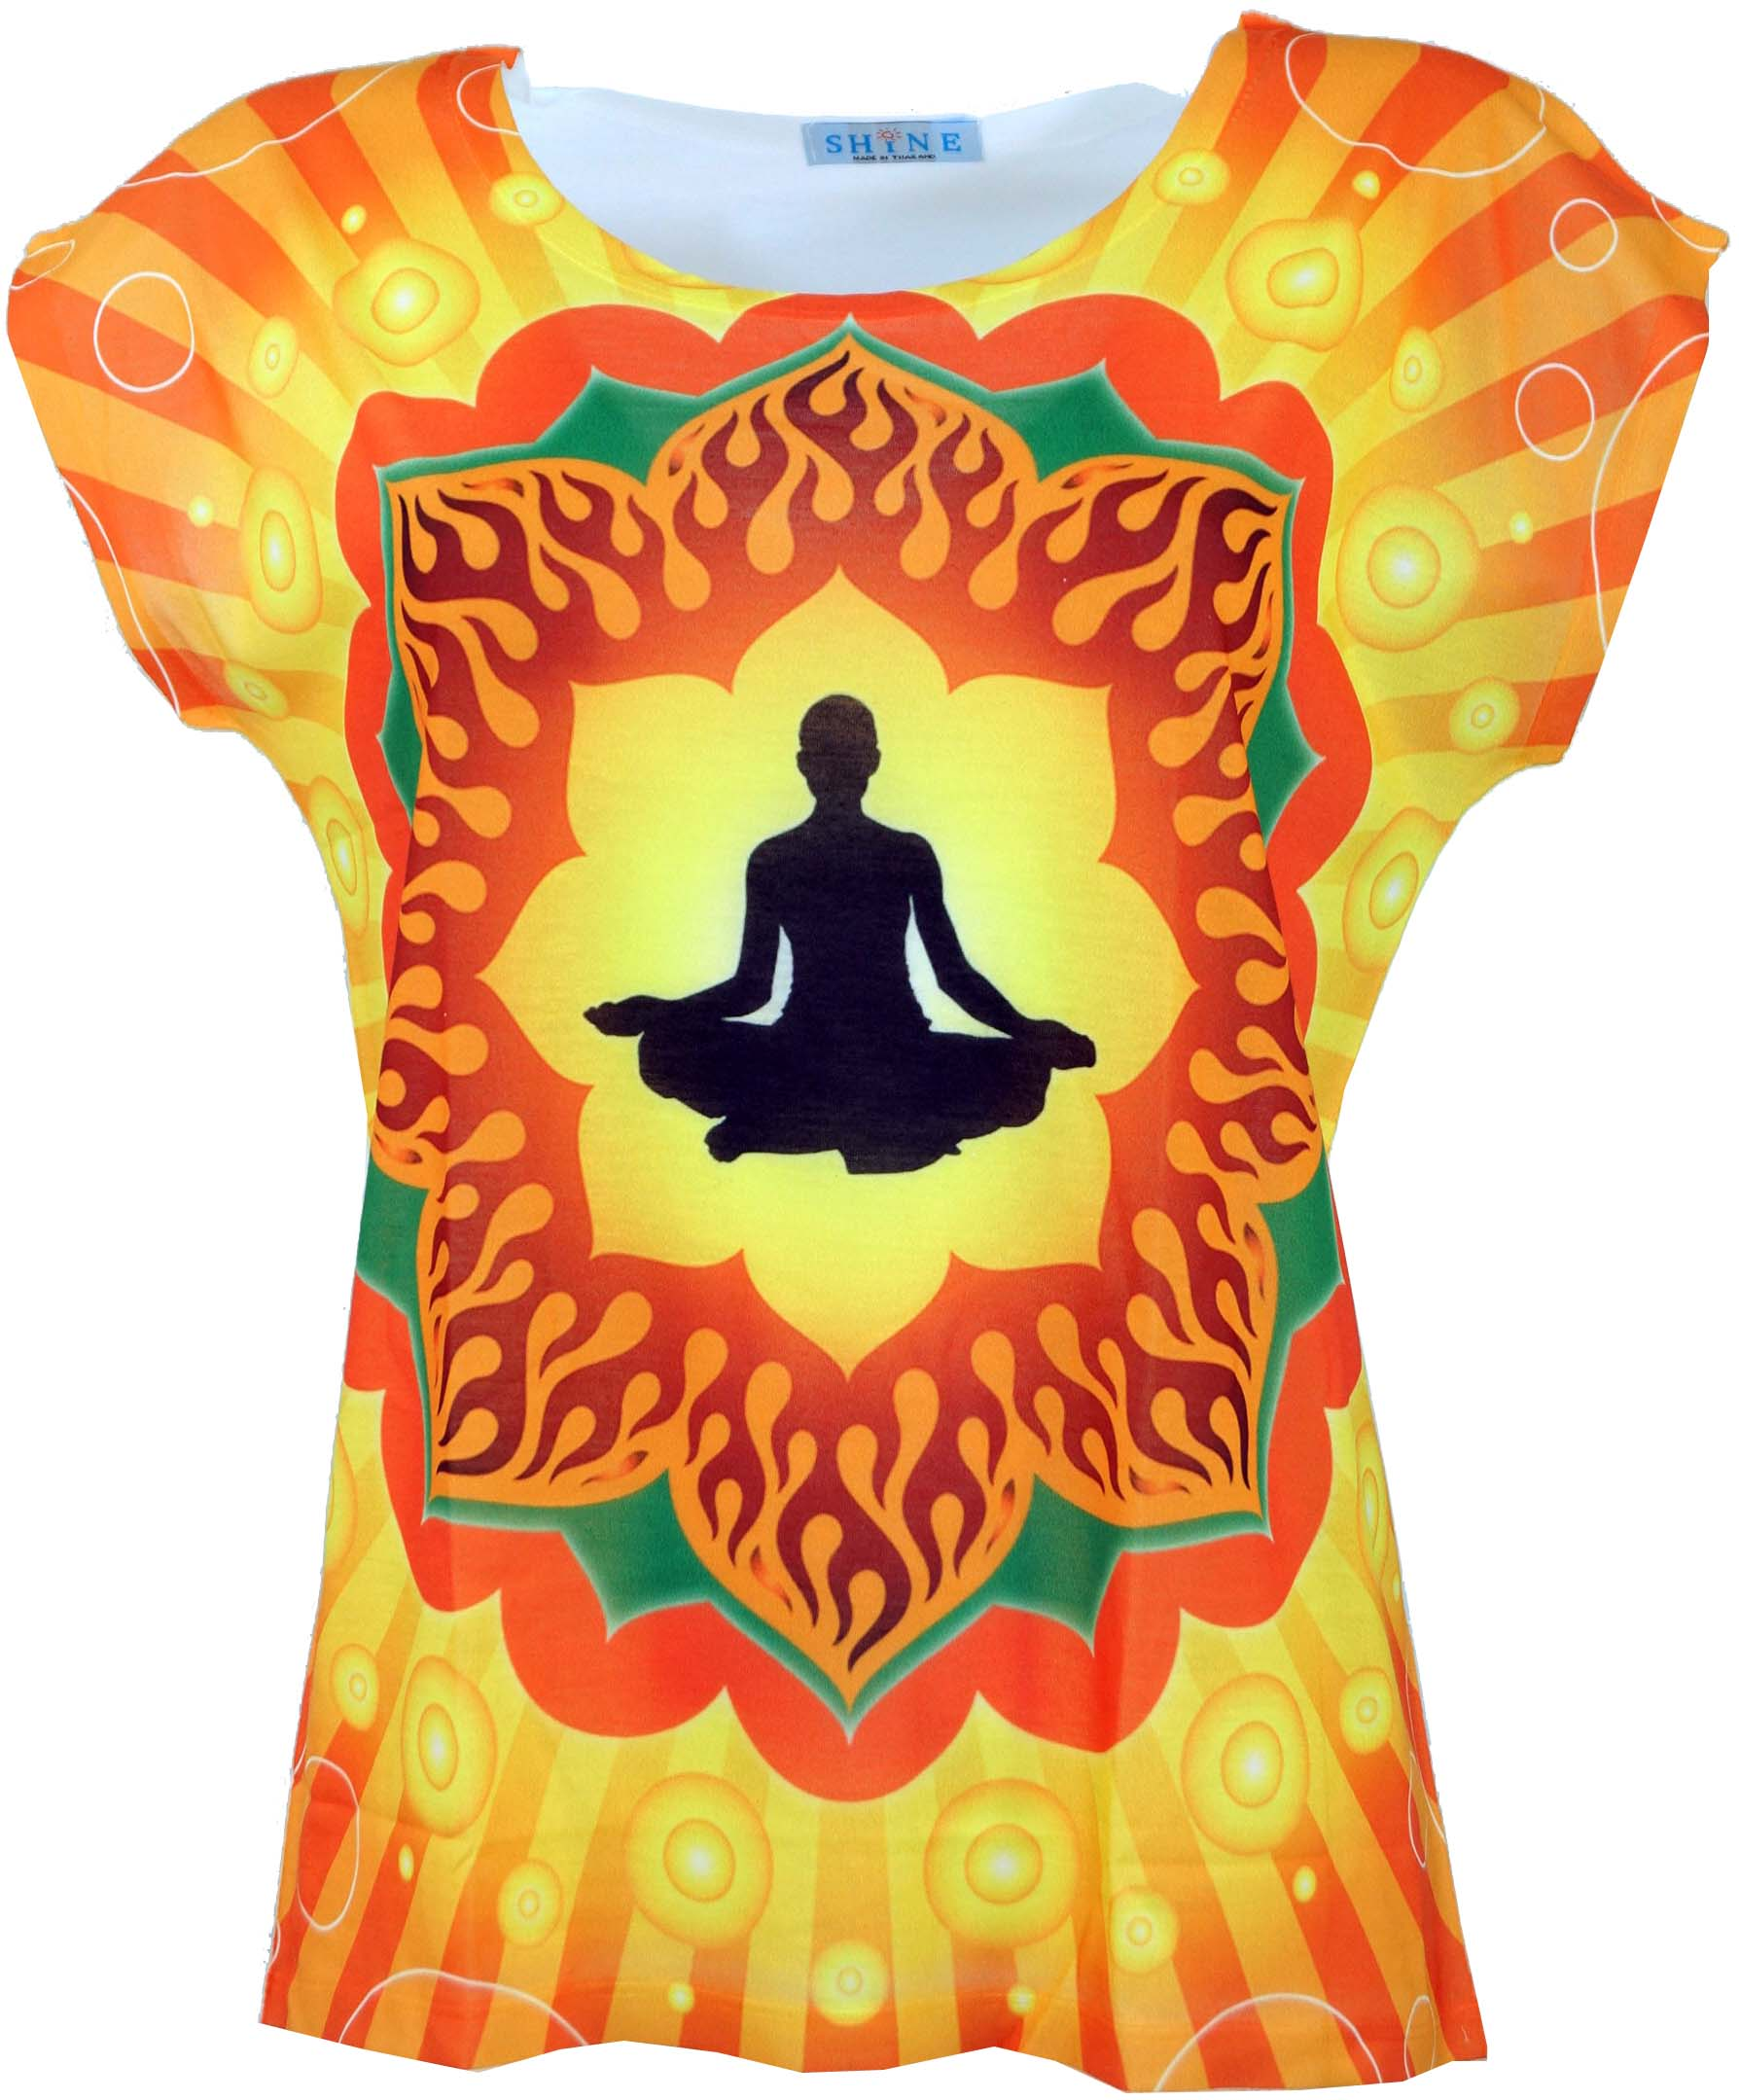 GURU-SHOP Yoga Top Mandala Petrol and Shirts//Tops